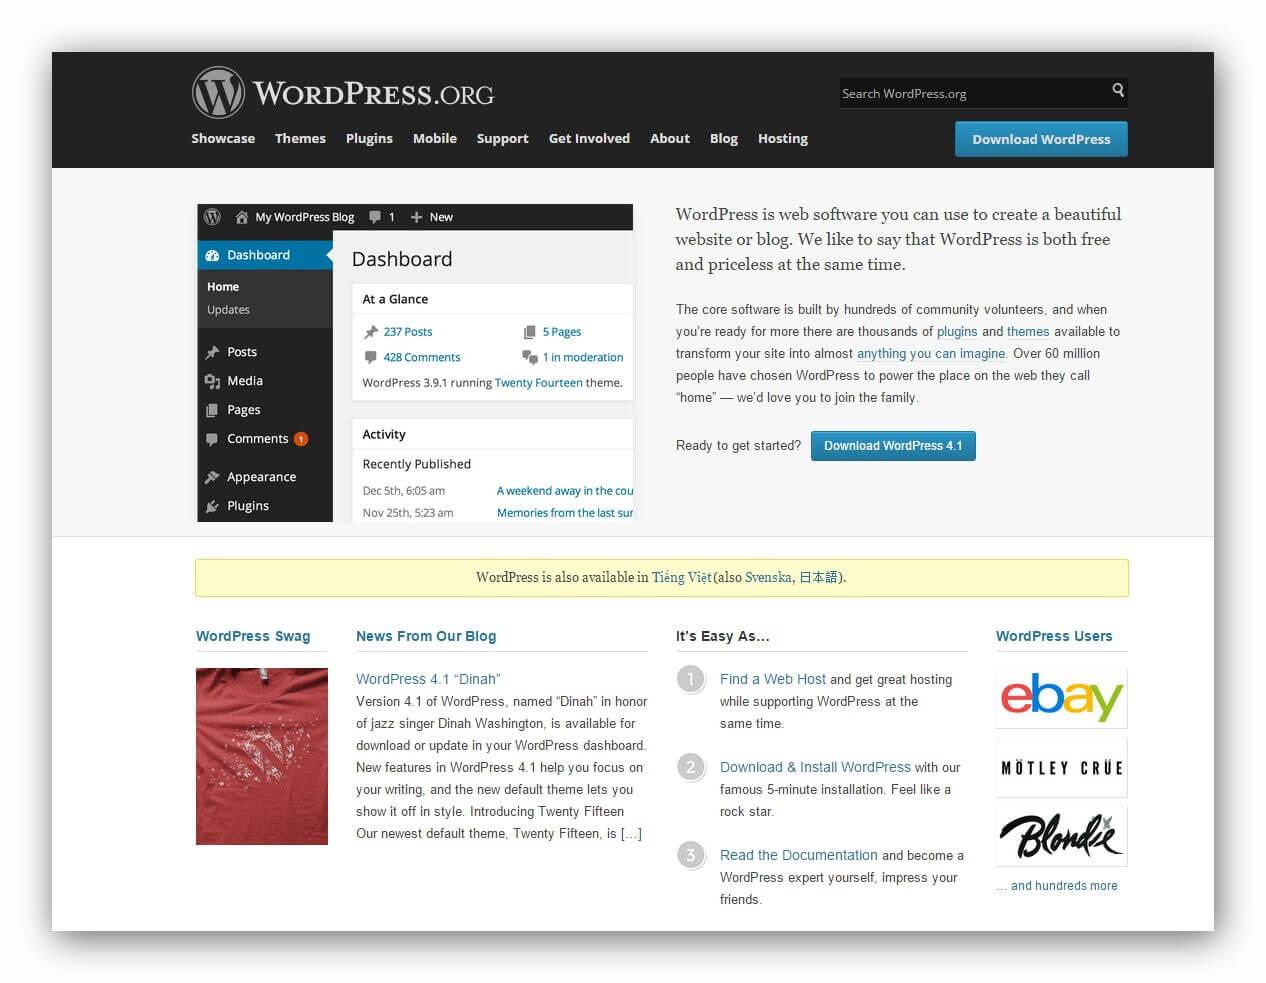 giao diện WordPress.org và WordPress.com